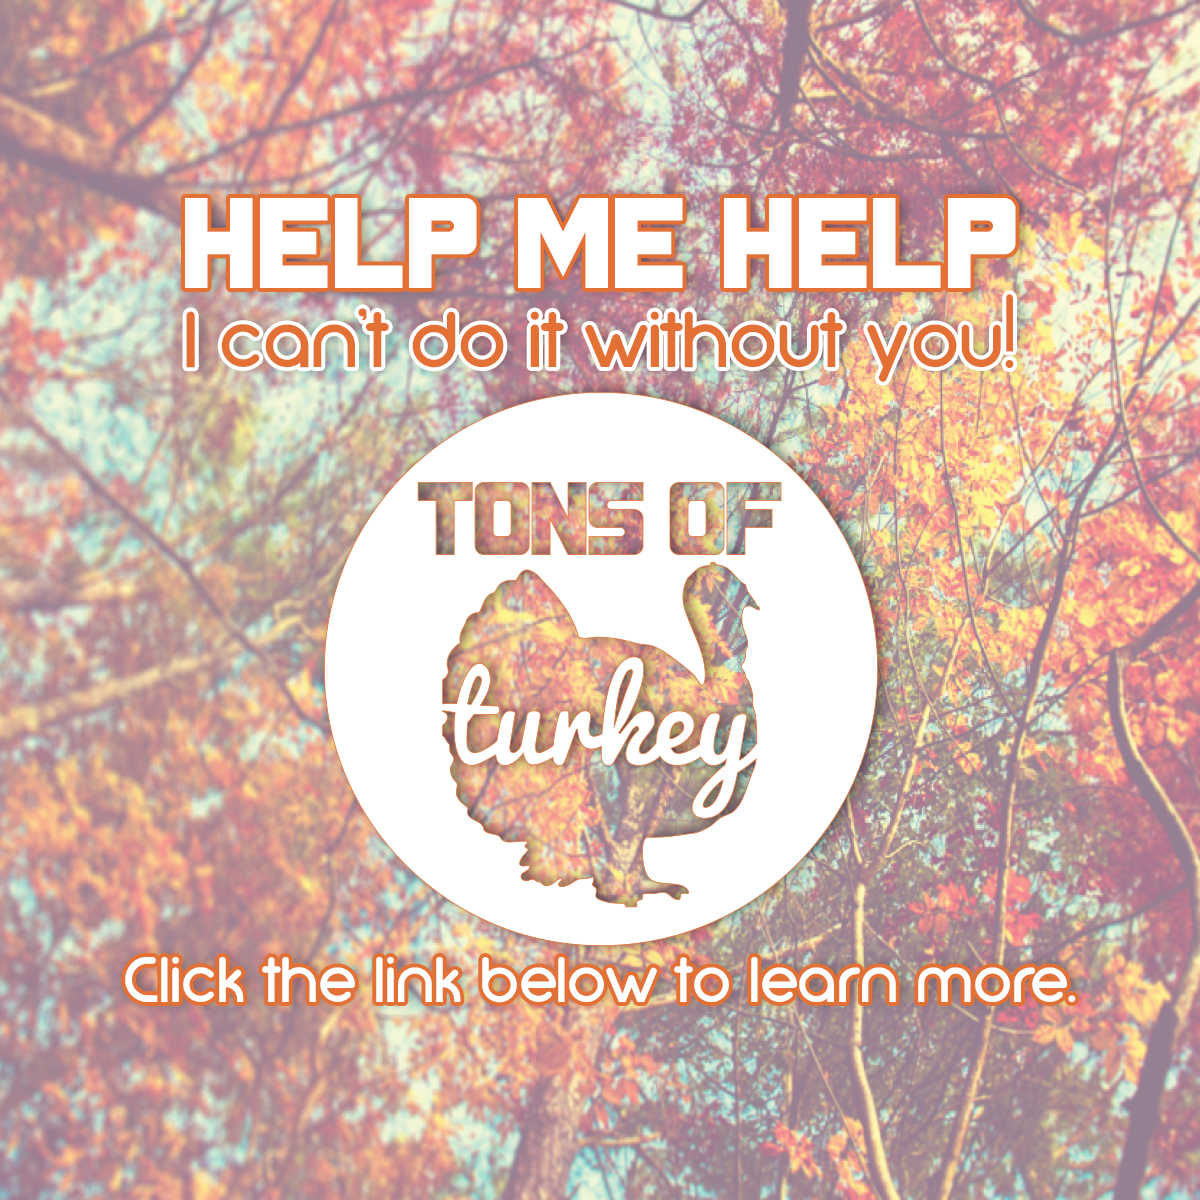 Help Me Help!